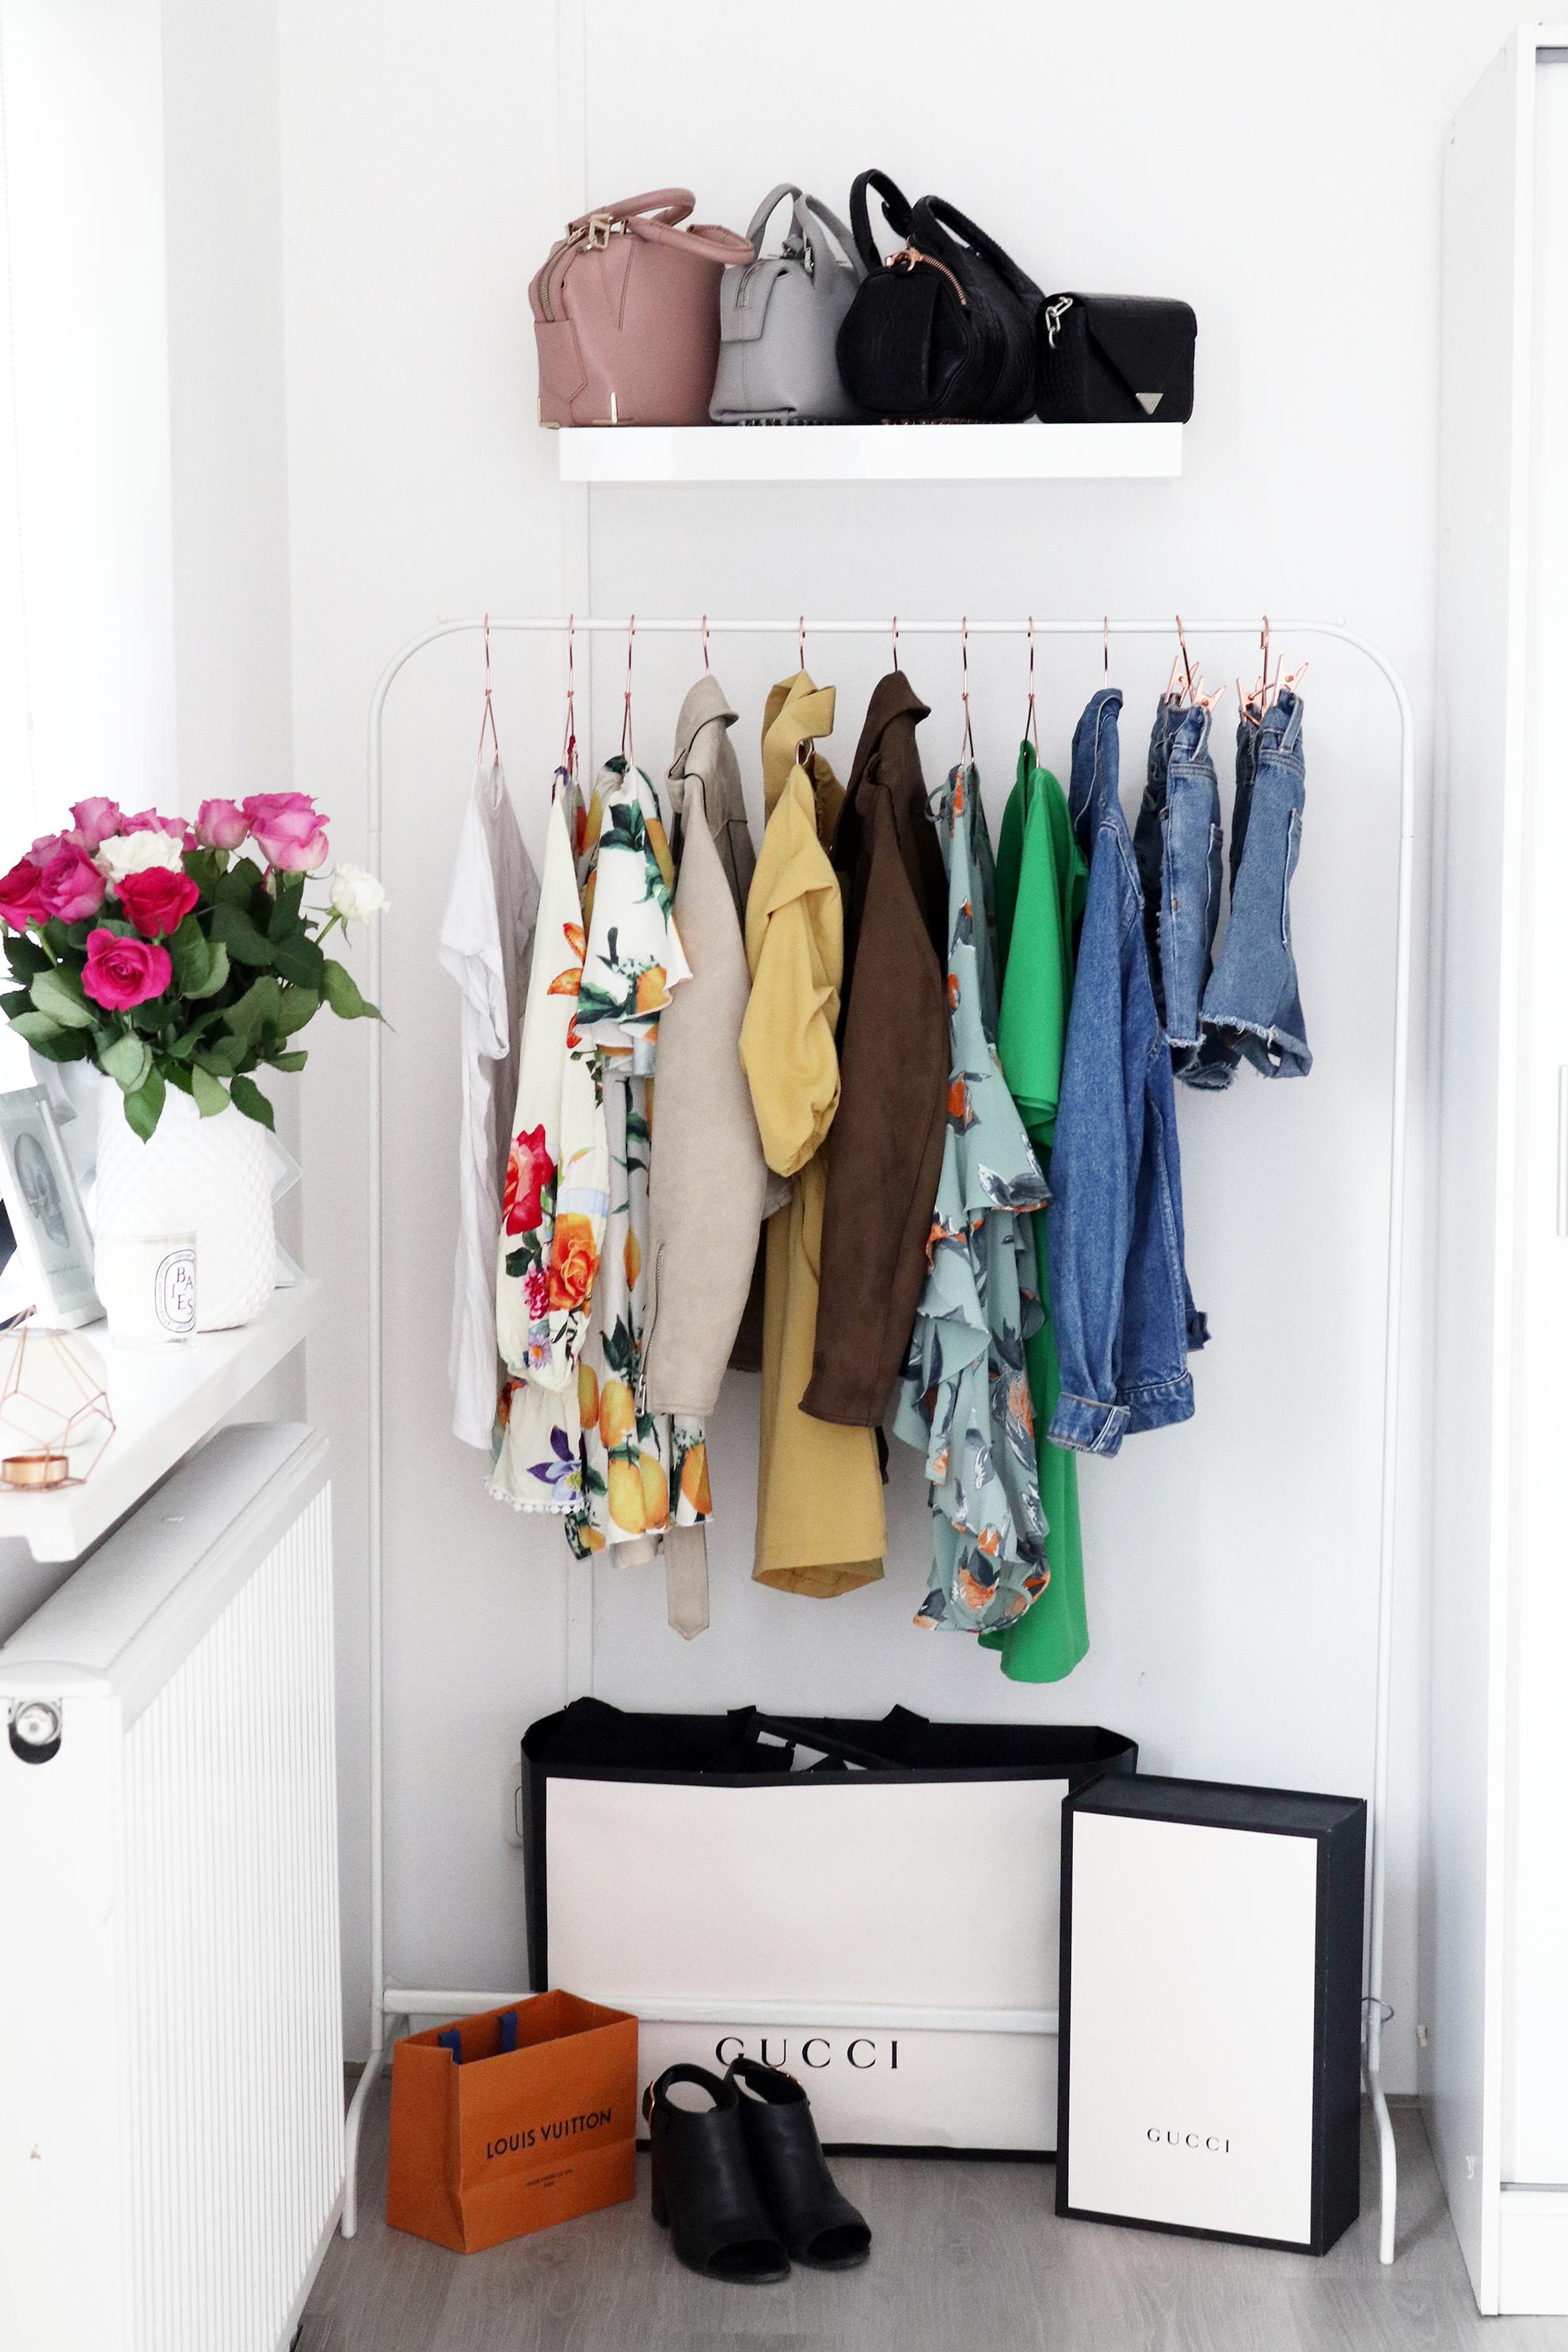 SUMMER FASHION GUIDE | Trends & Capsule Wardrobe Basics